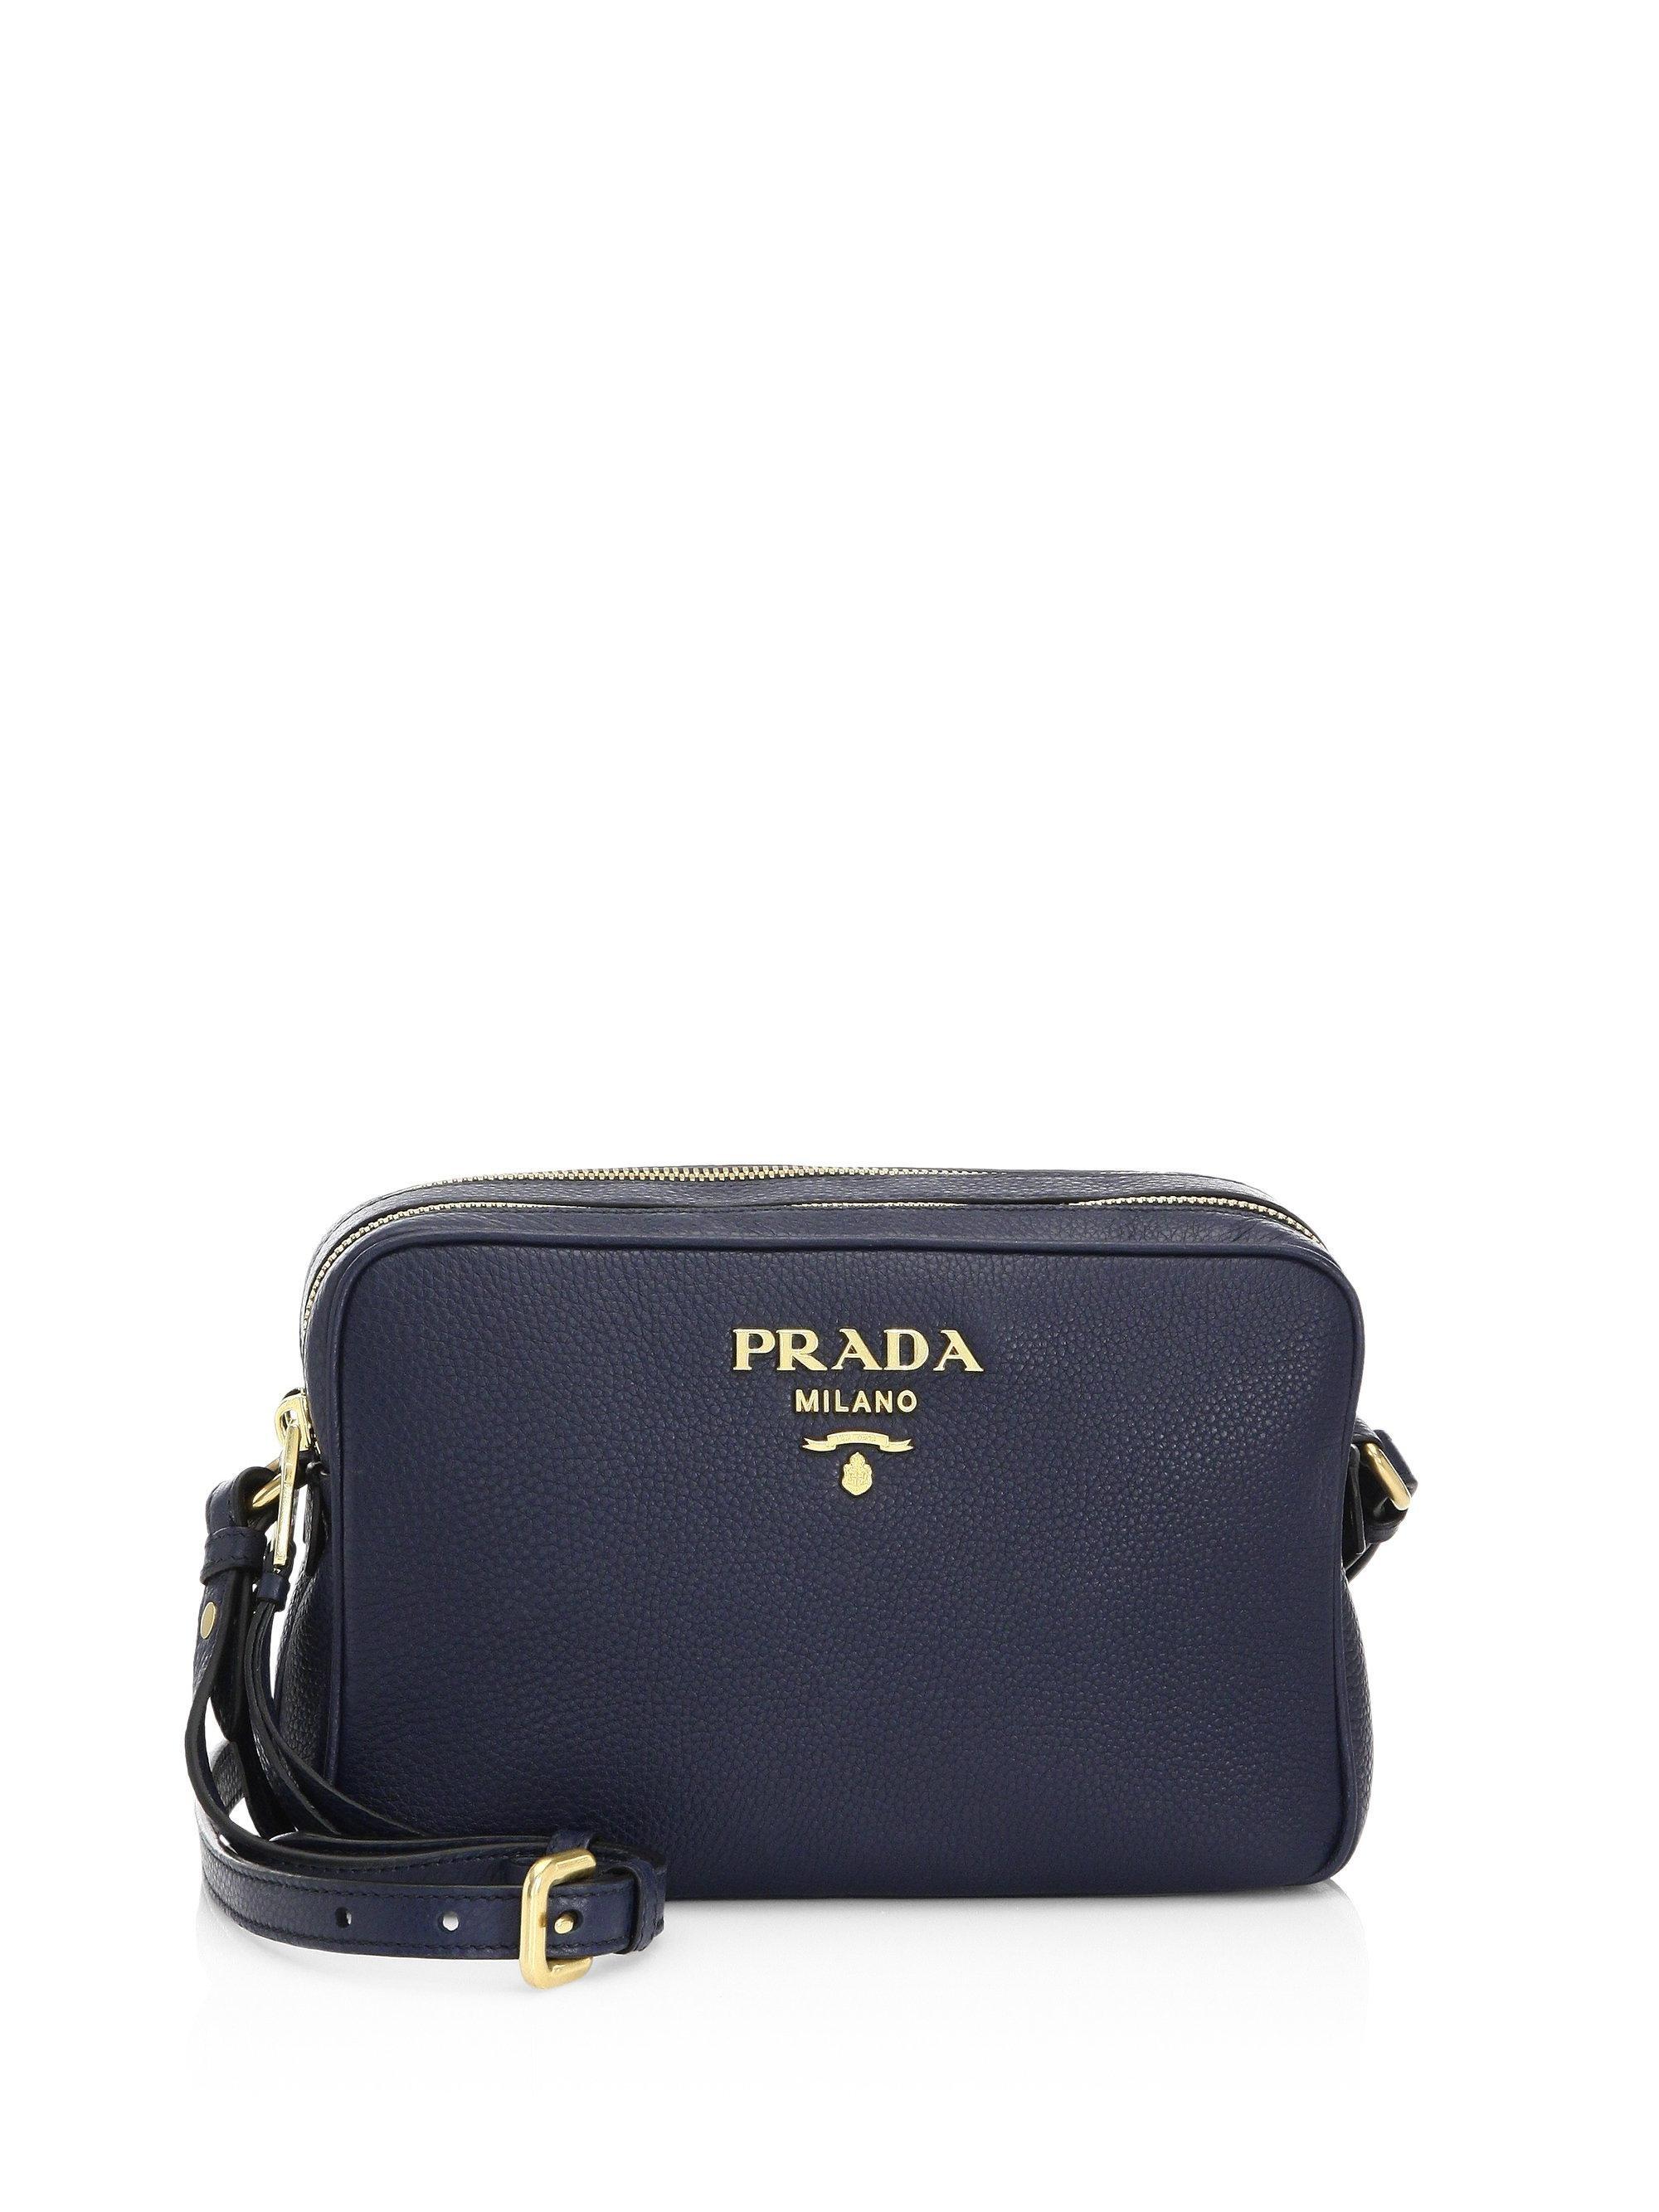 6d2014882713 reduced lyst prada saffiano leather camera bag in gray 6f461 e16dc; get lyst  prada daino crossbody camera bag in blue 35ad4 783fc